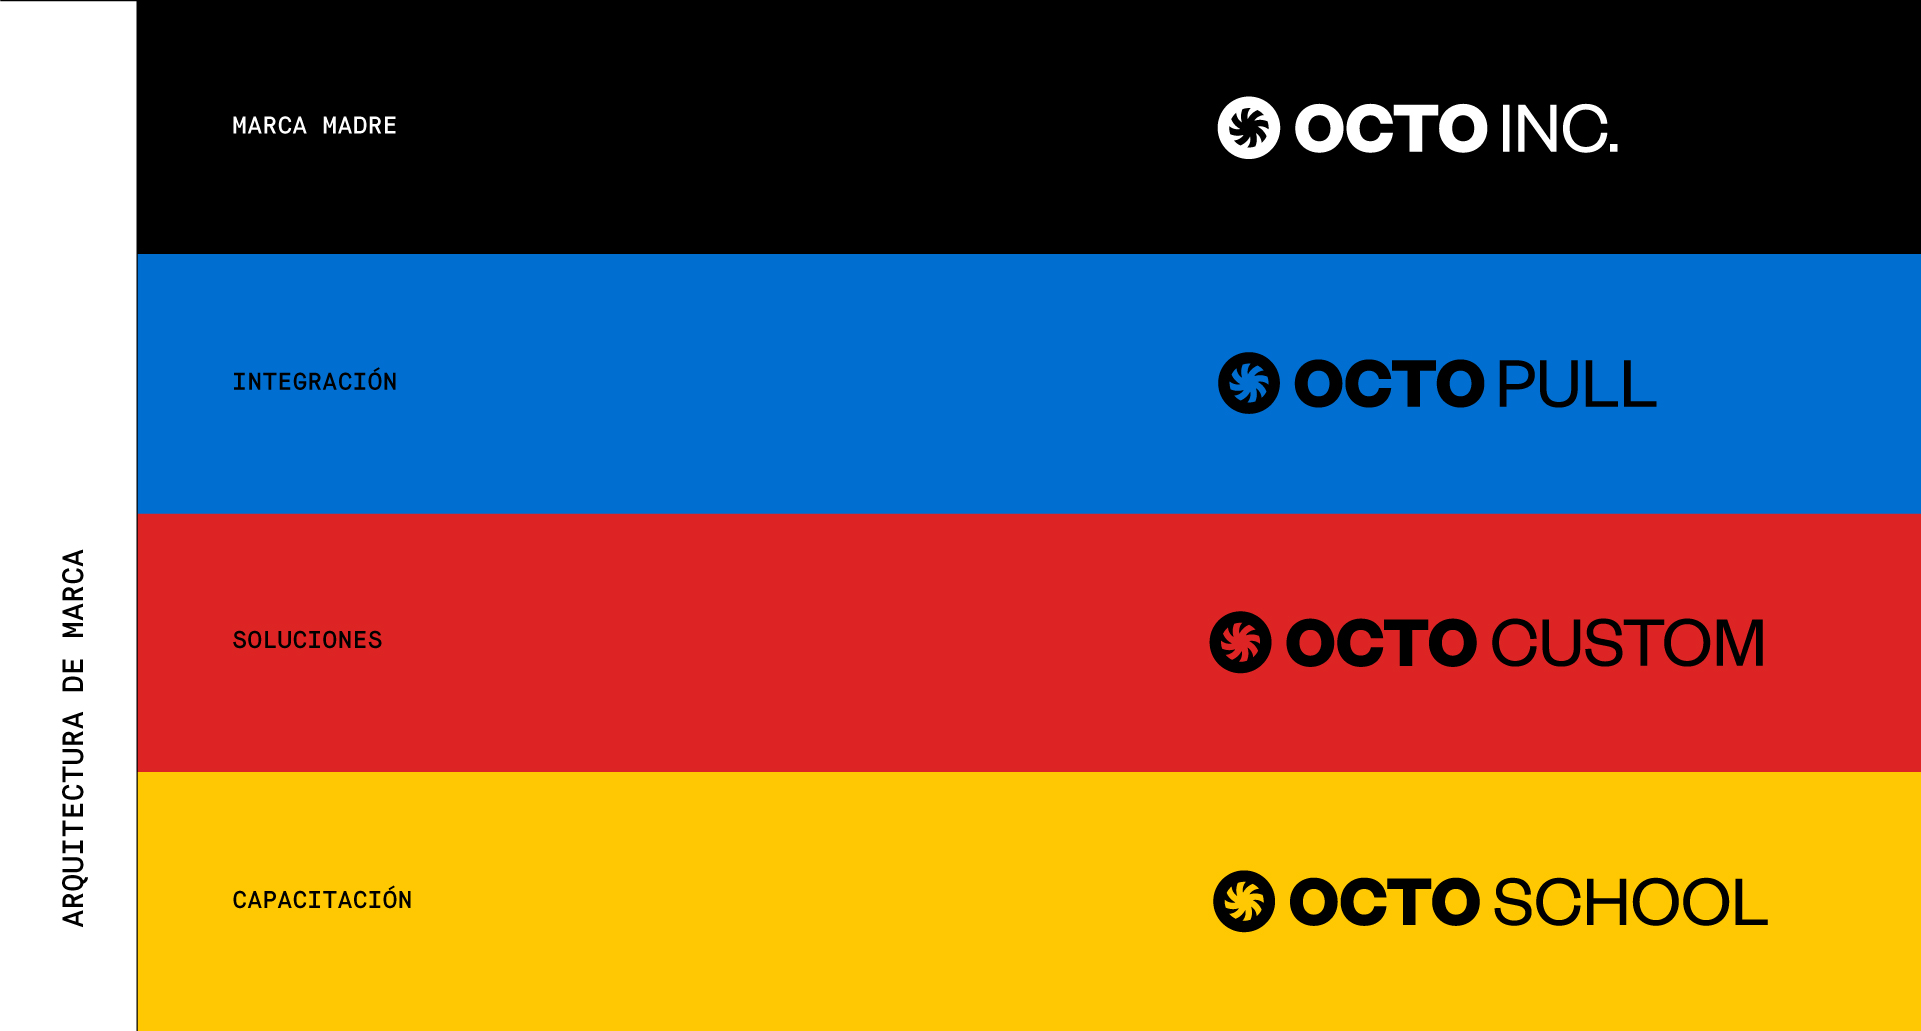 Octo-Inc-Playbook.jpg